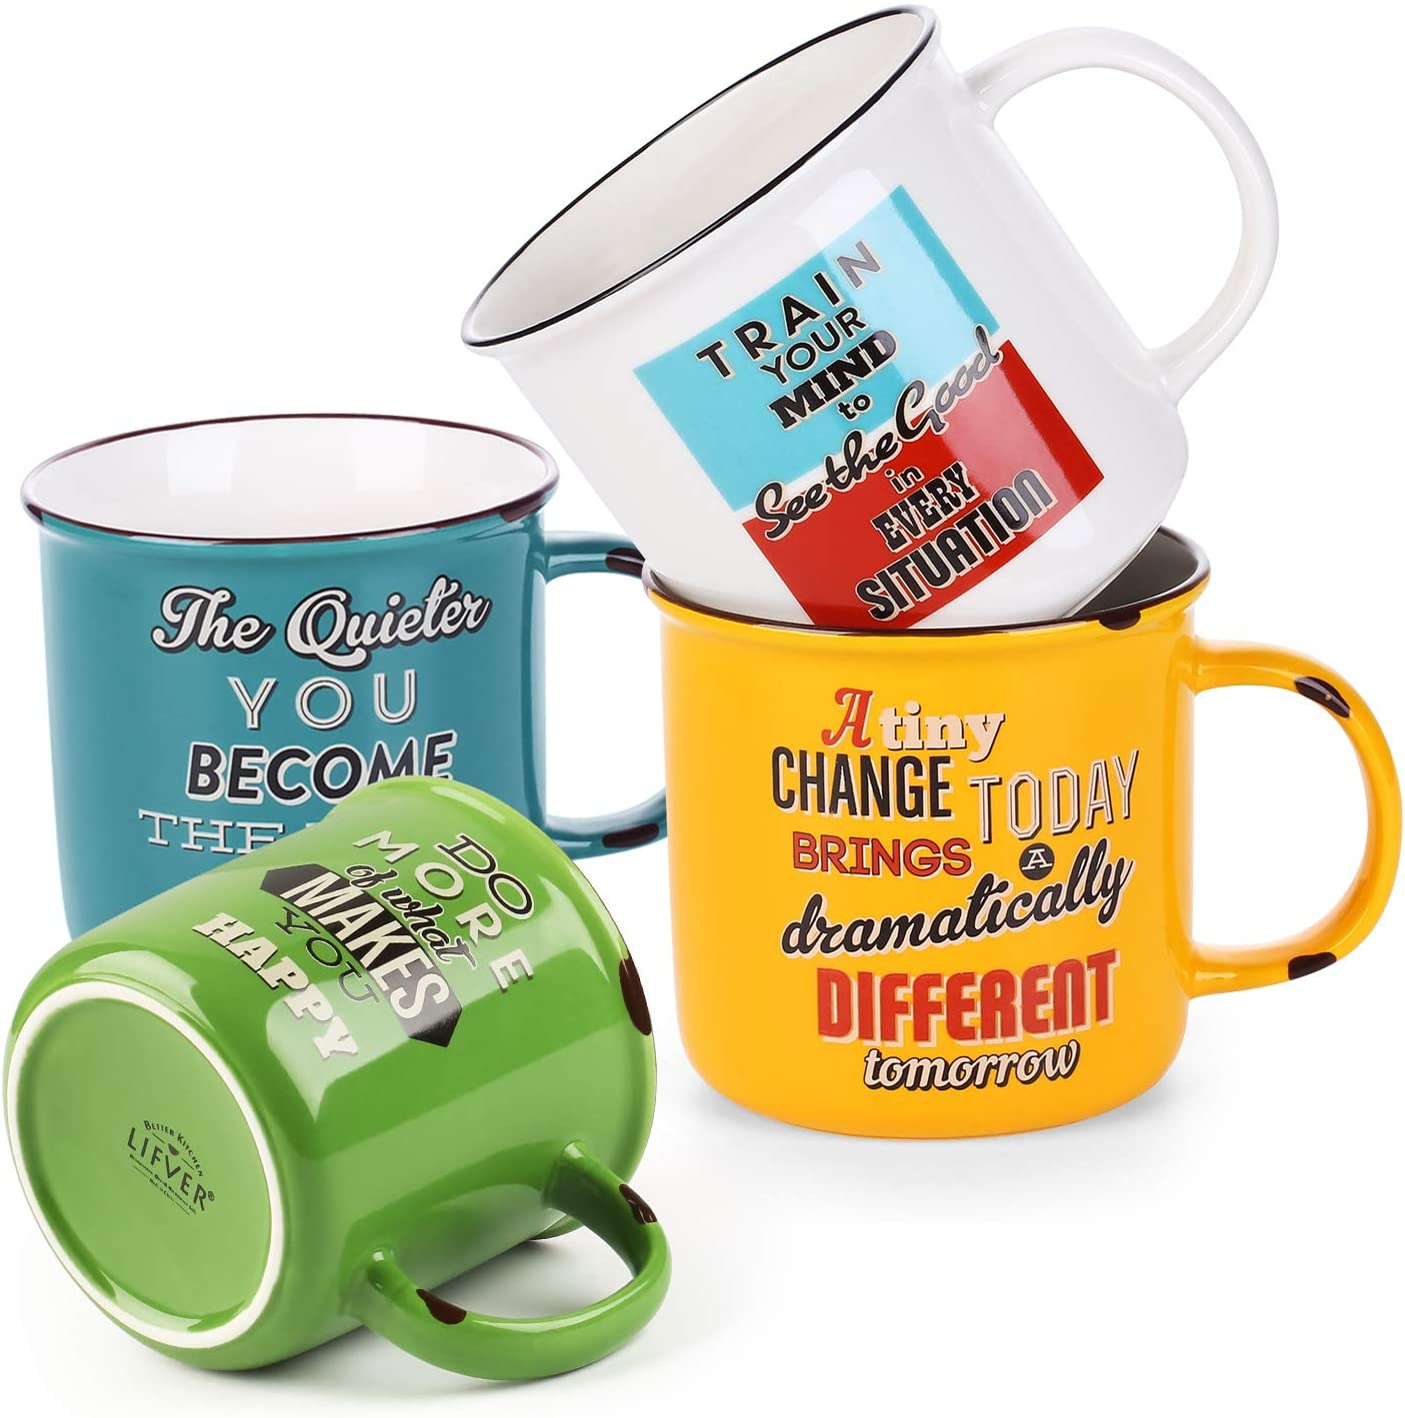 LIFVER 18 oz Coffee Mugs Set Porcelain Large for Max 69% OFF Coff of 4 Japan Maker New